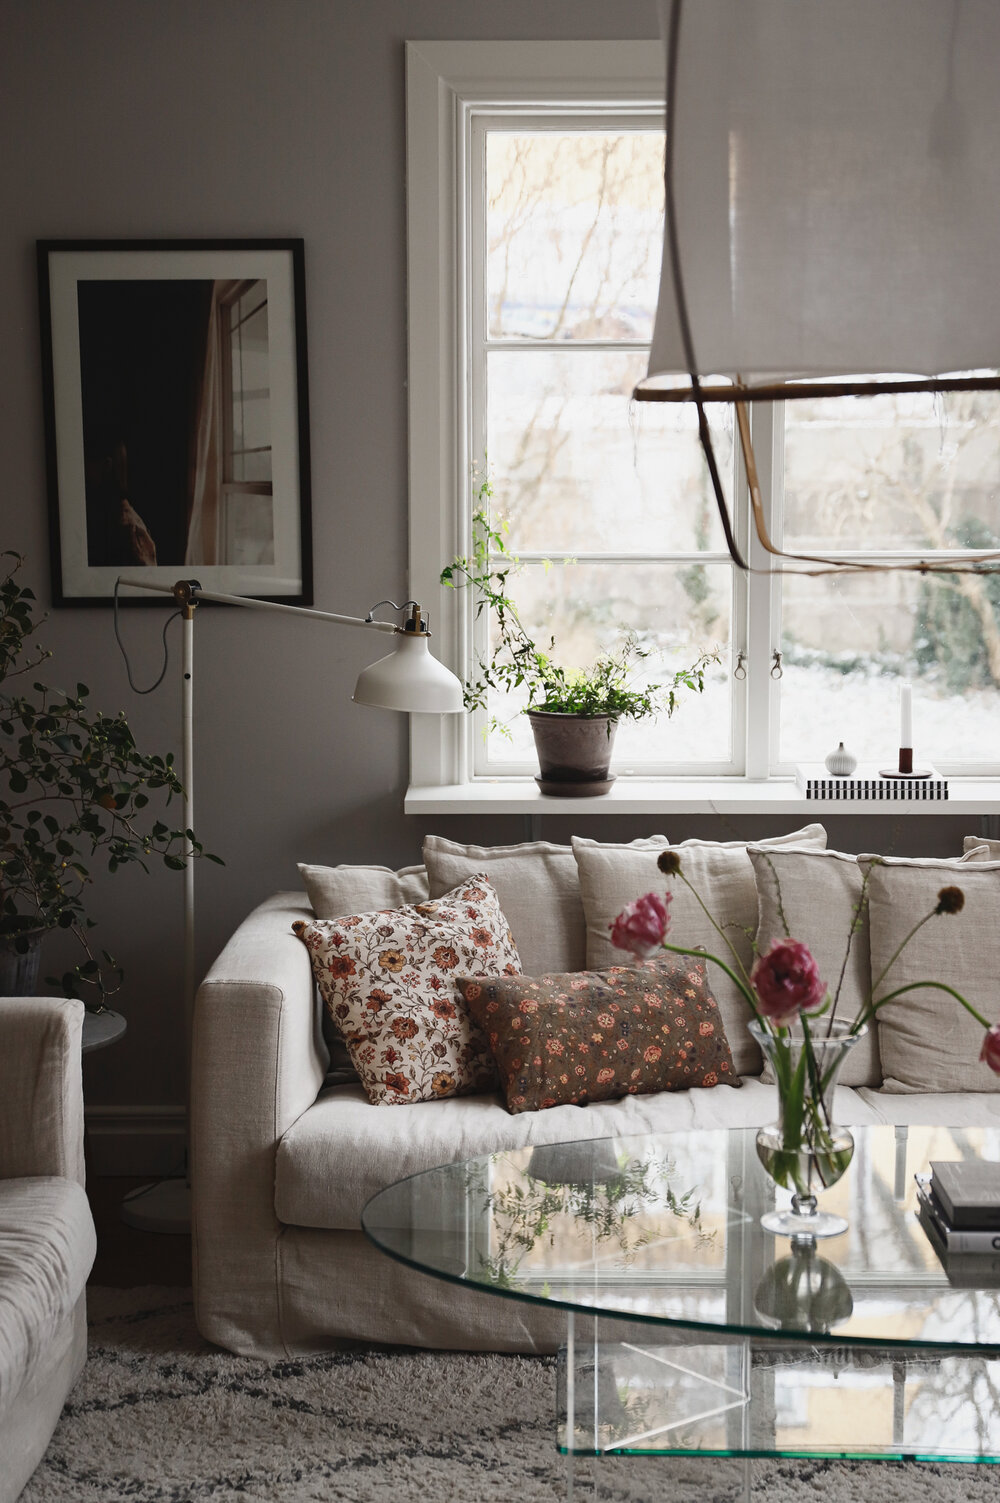 Interior trends 2021: Earthy tones to bring Nature indoor